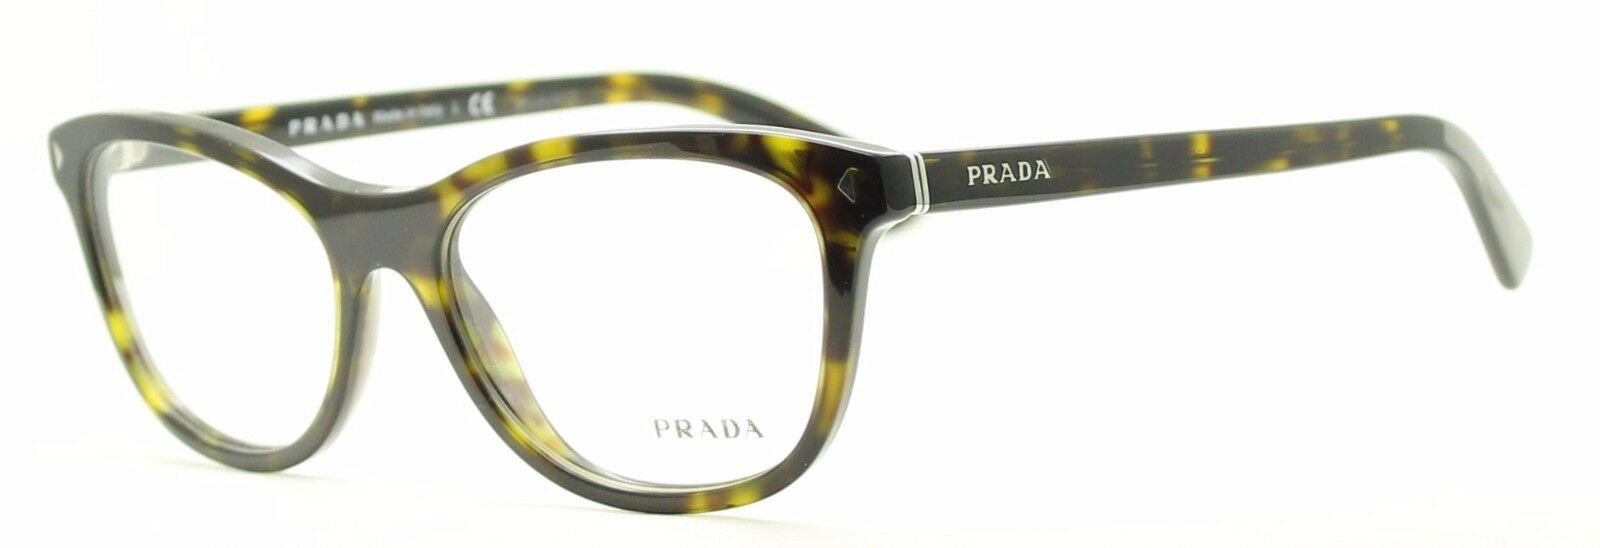 cd11edfbc3dc PRADA VPR 05r 2au-1o1 Dark Havana Brille Glasses Eyeglasses Frames ...